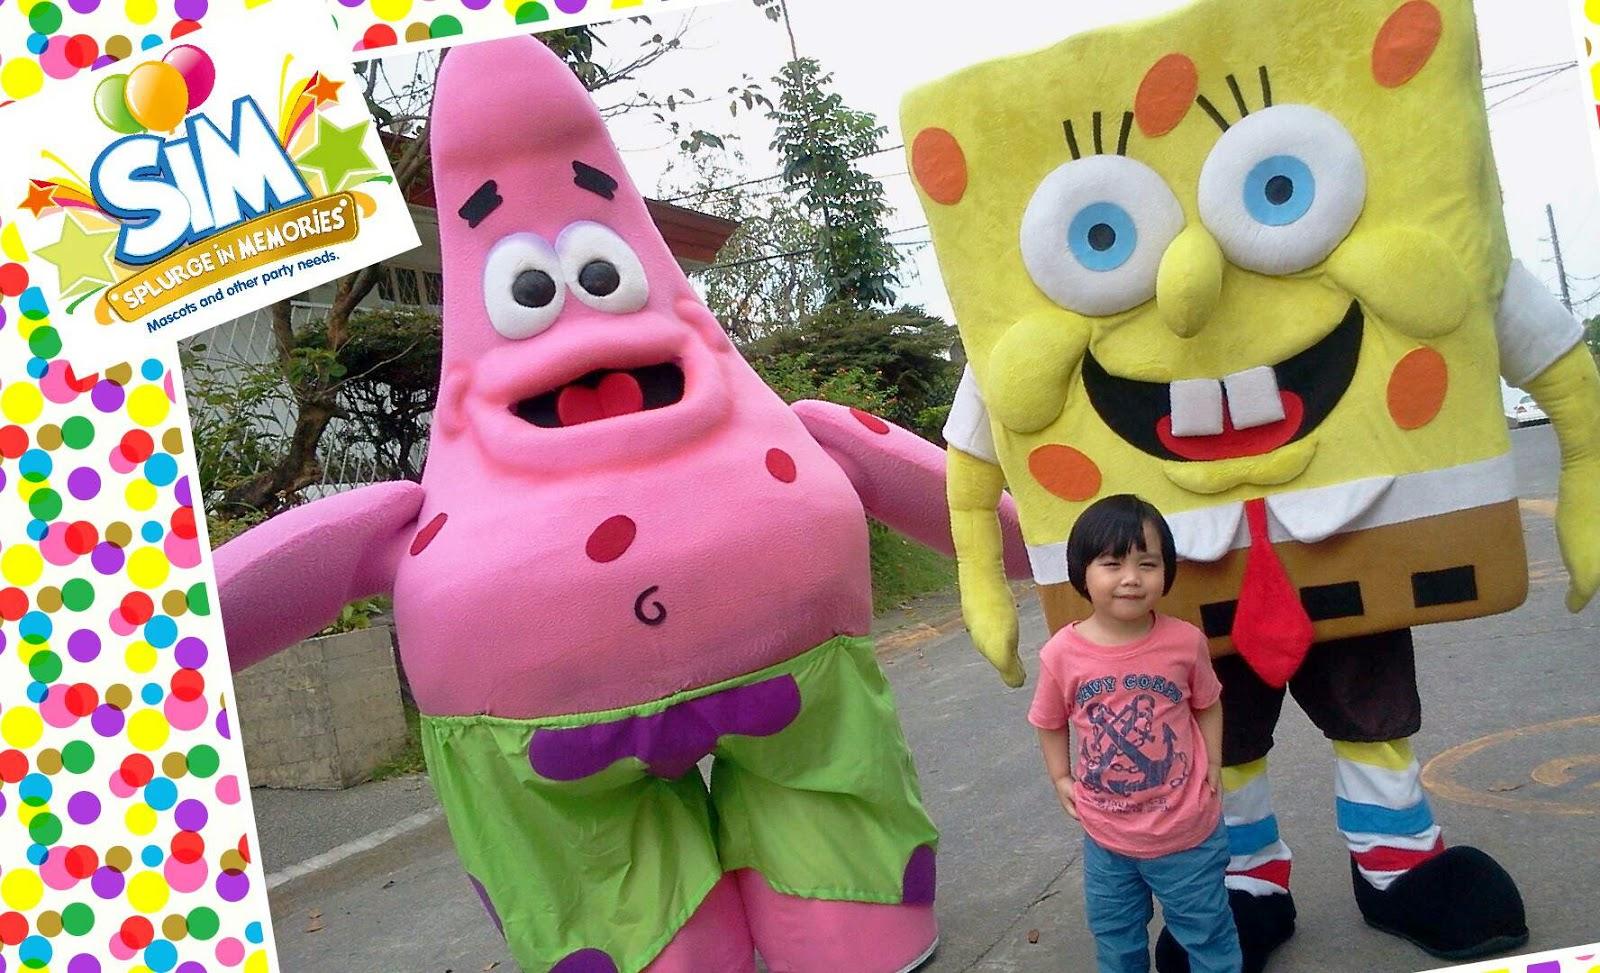 spongebob squarepants mascot